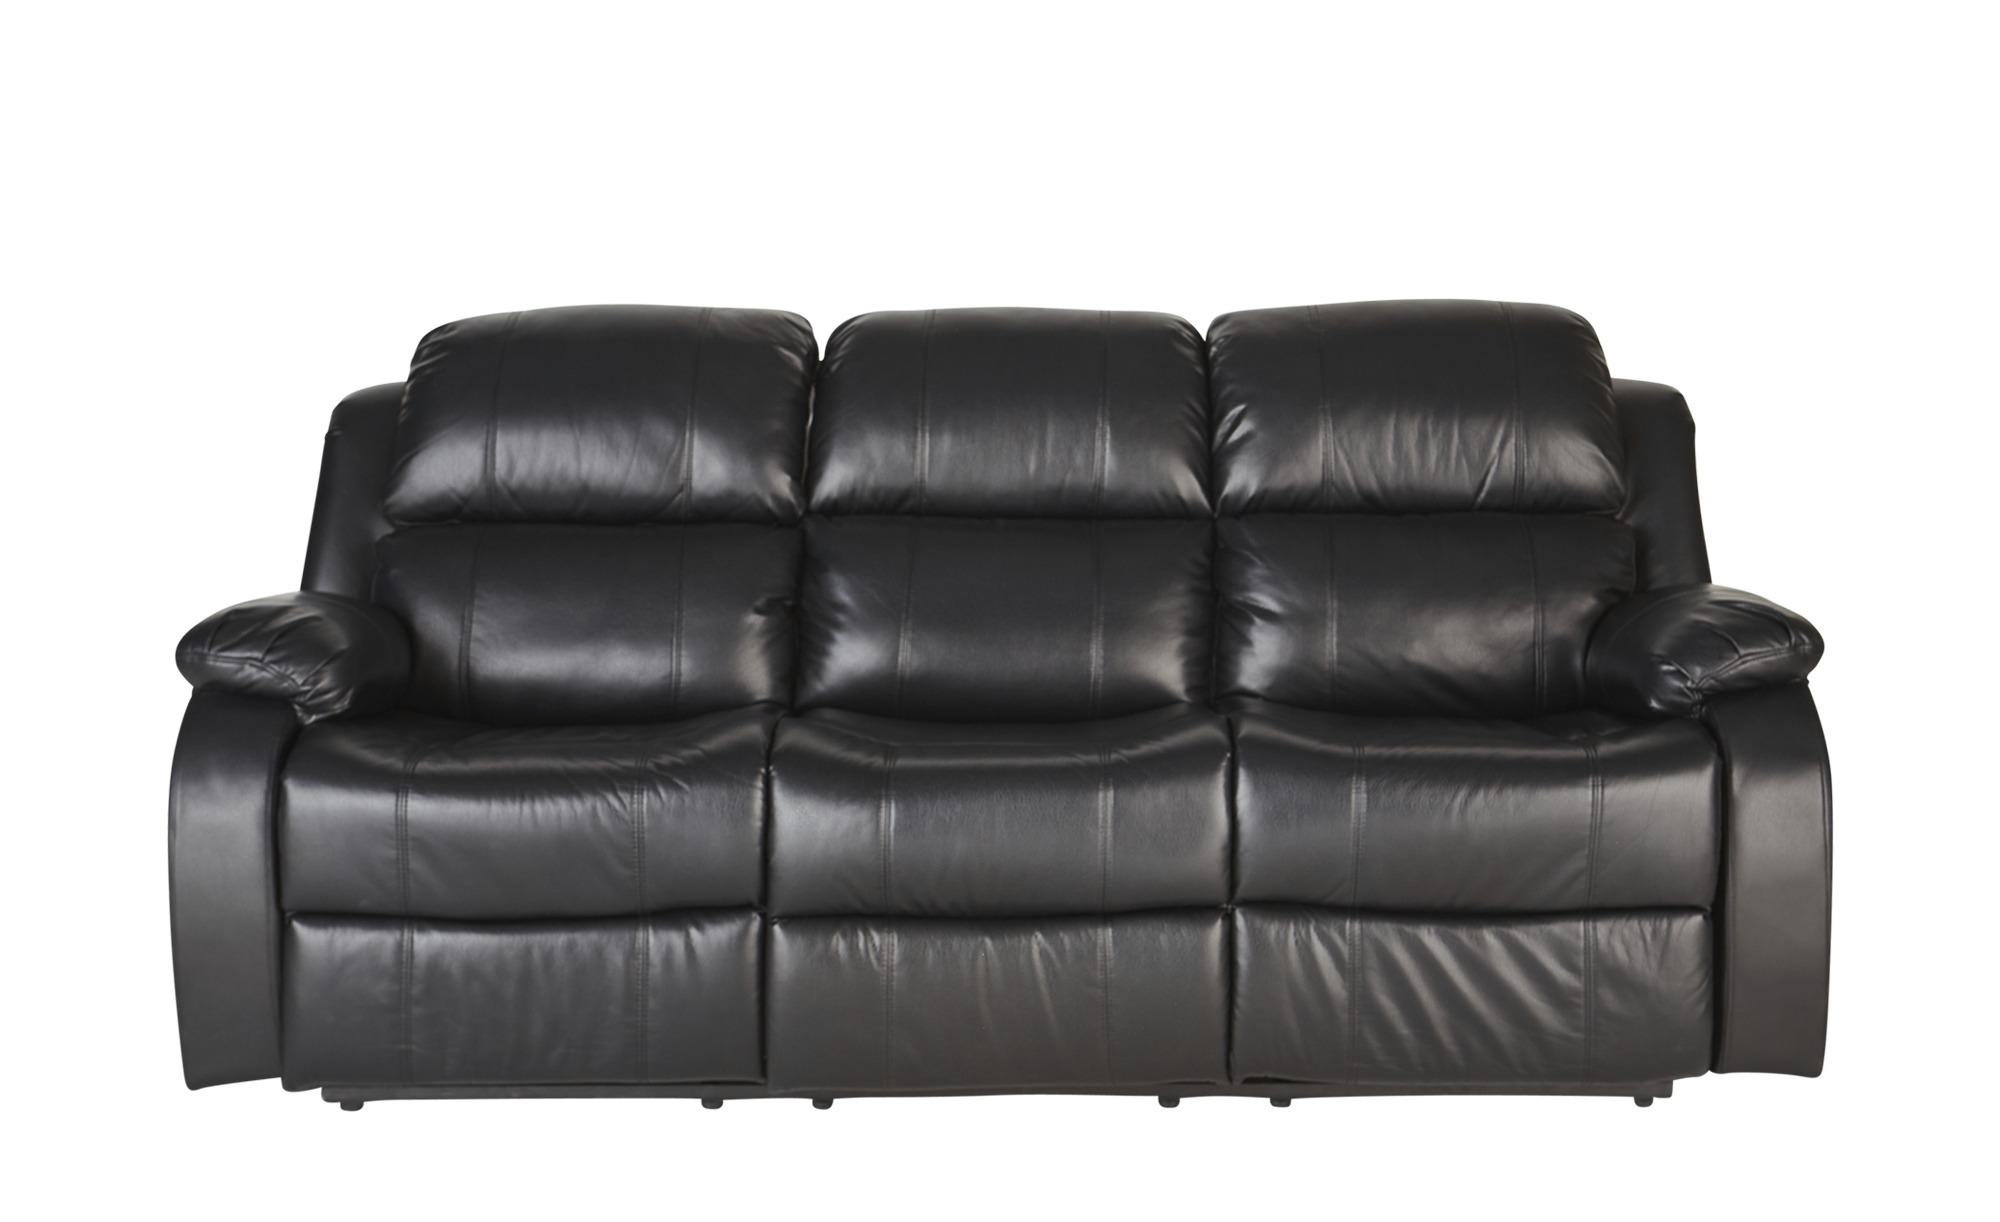 3-Sitzer Schwarz - schwarz - Sconto